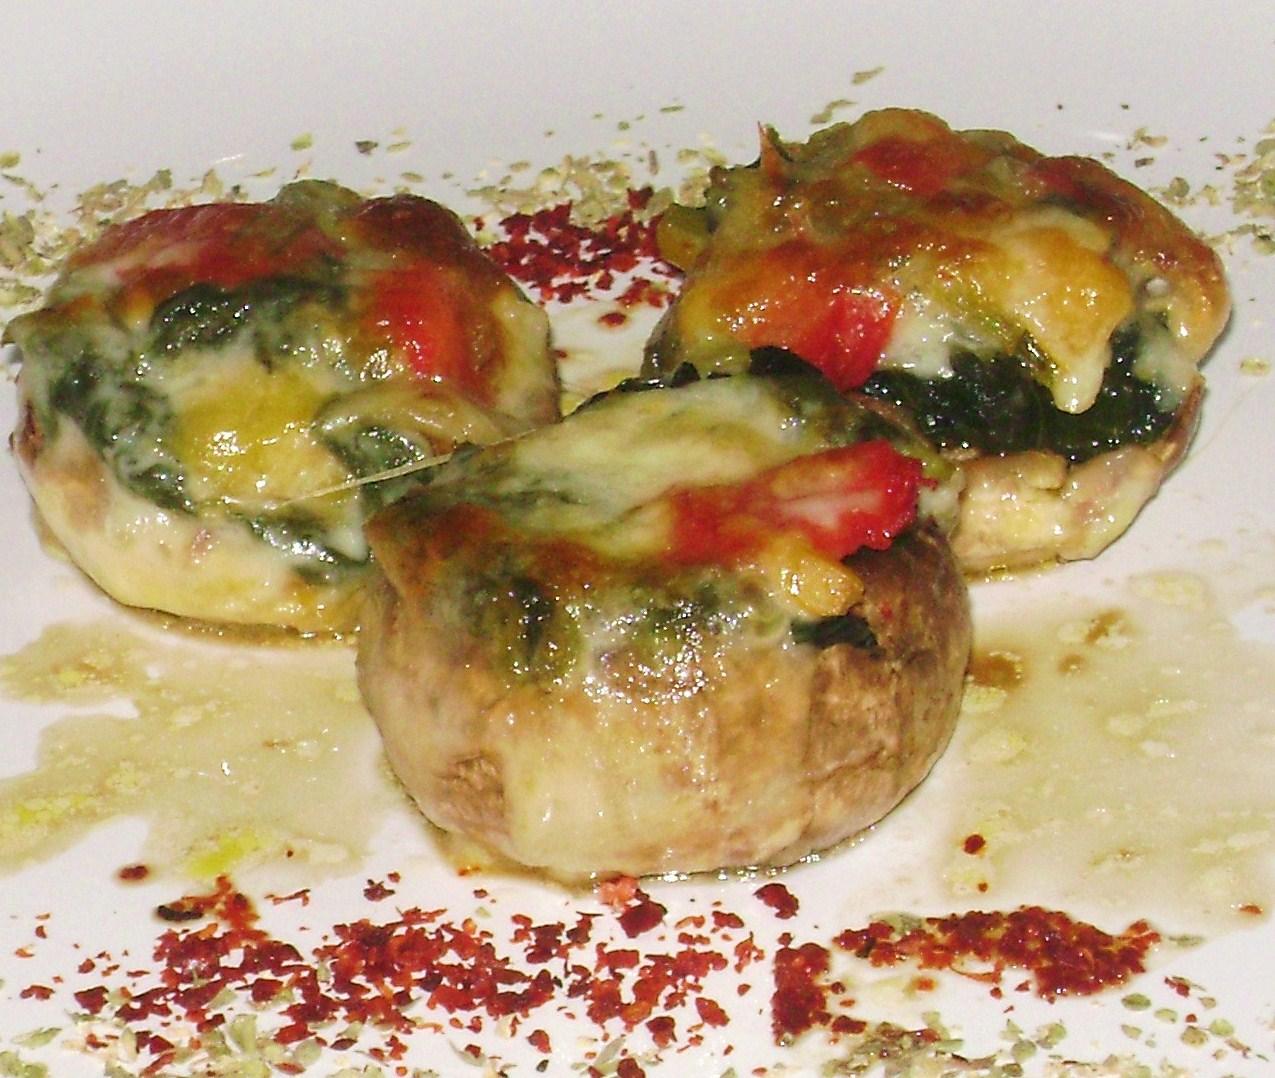 Tavuklu ıspanaklı mantar dolması tarifi